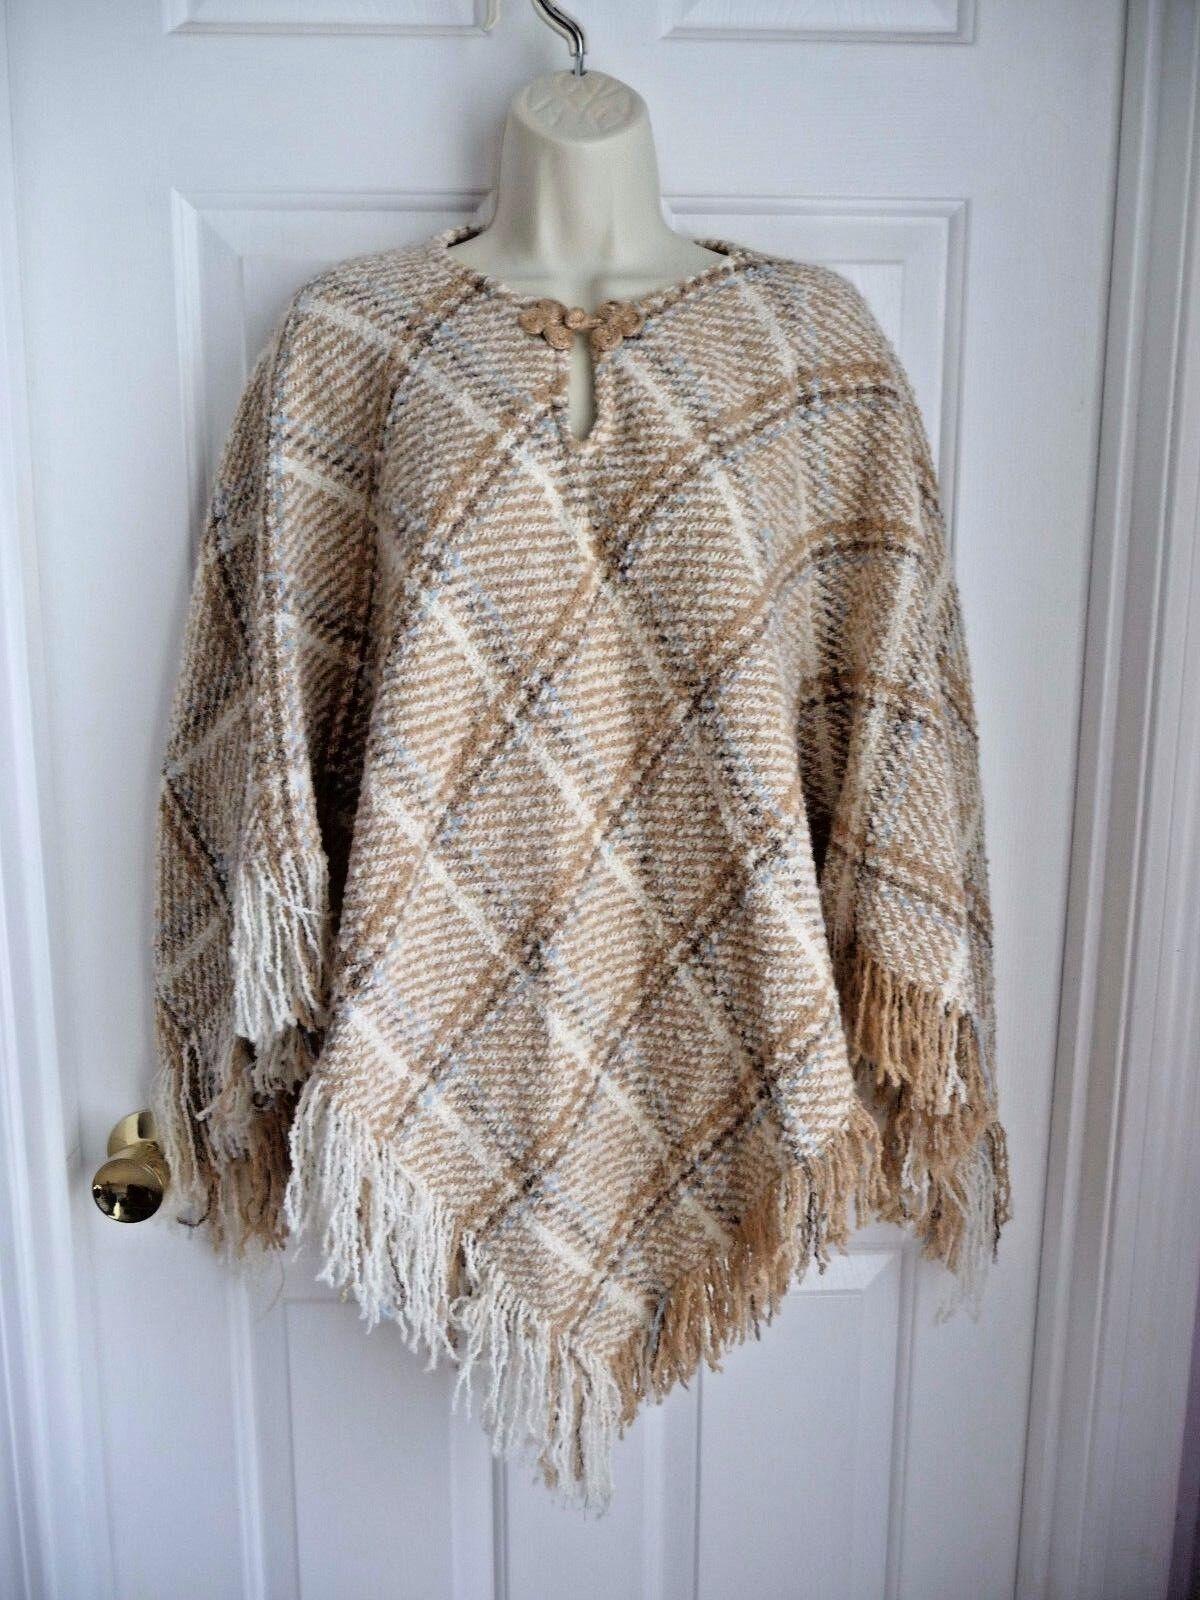 Boyne Valley Weavers Poncho Cape Sweater Ireland Made Frinched Alpaca Plaid NICE